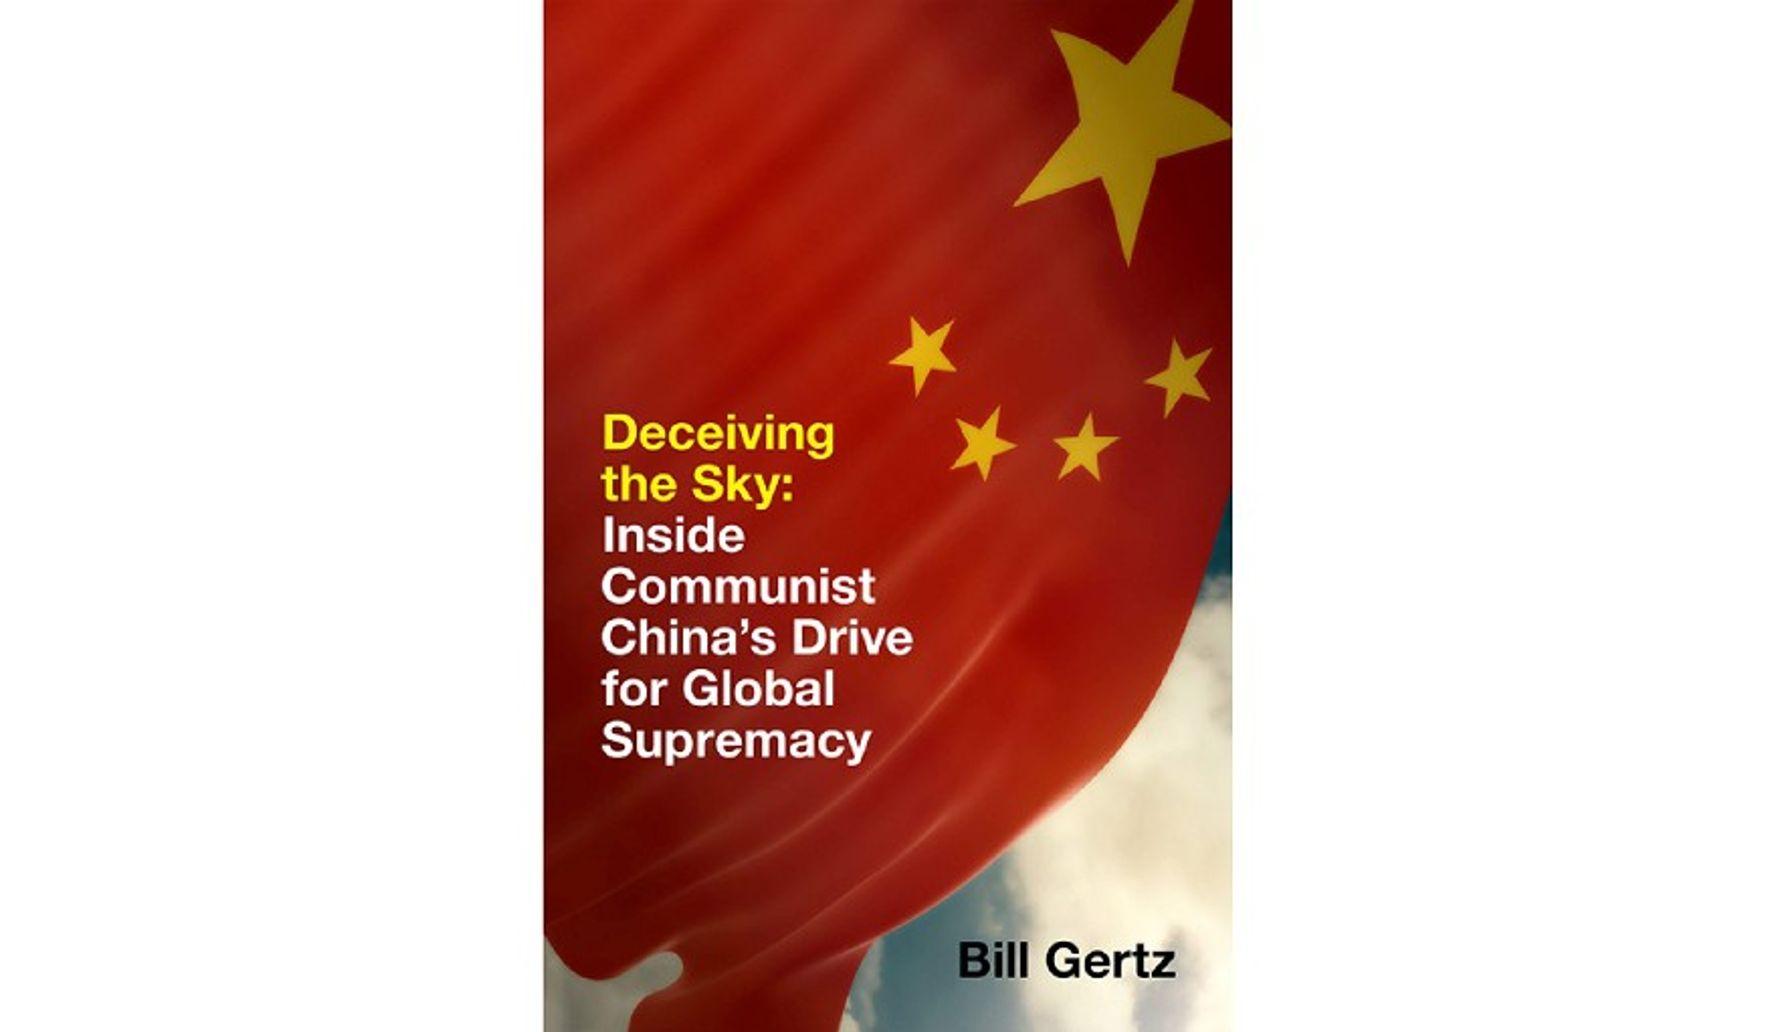 BOOK REVIEW: 'Deceiving the Sky'